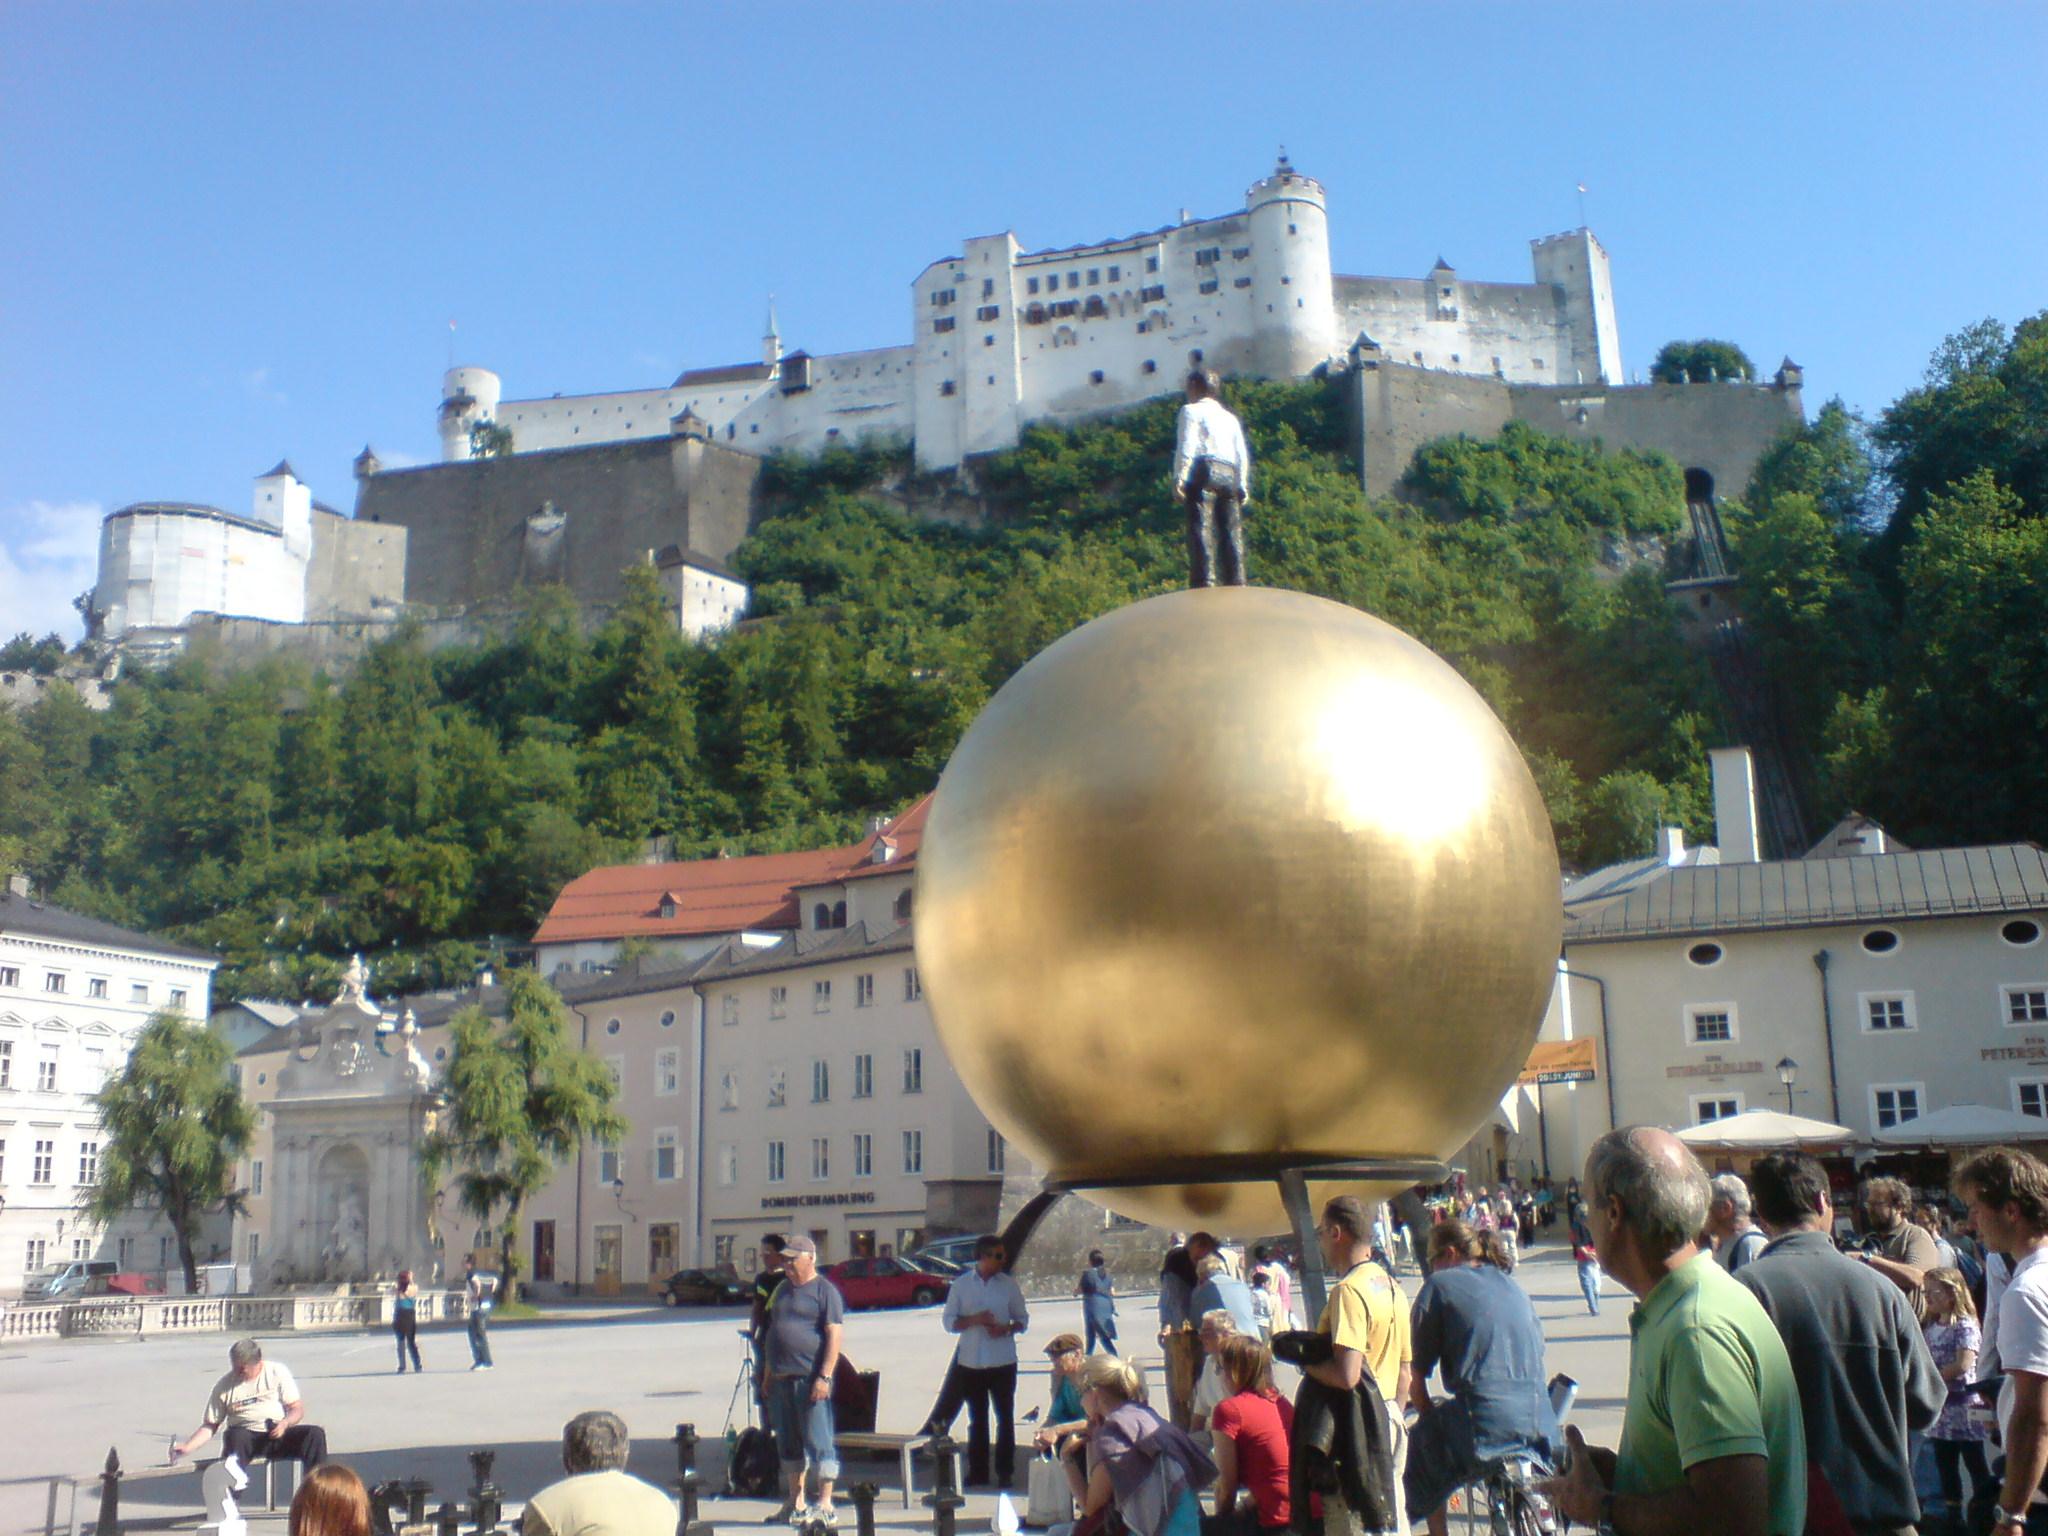 Spomenik povijesti i umjetnosti u Salzburgu. Izvor: https://upload.wikimedia.org/wikipedia/commons/e/e2/Salzburg_is_a_monument_of_history_and_art.jpg